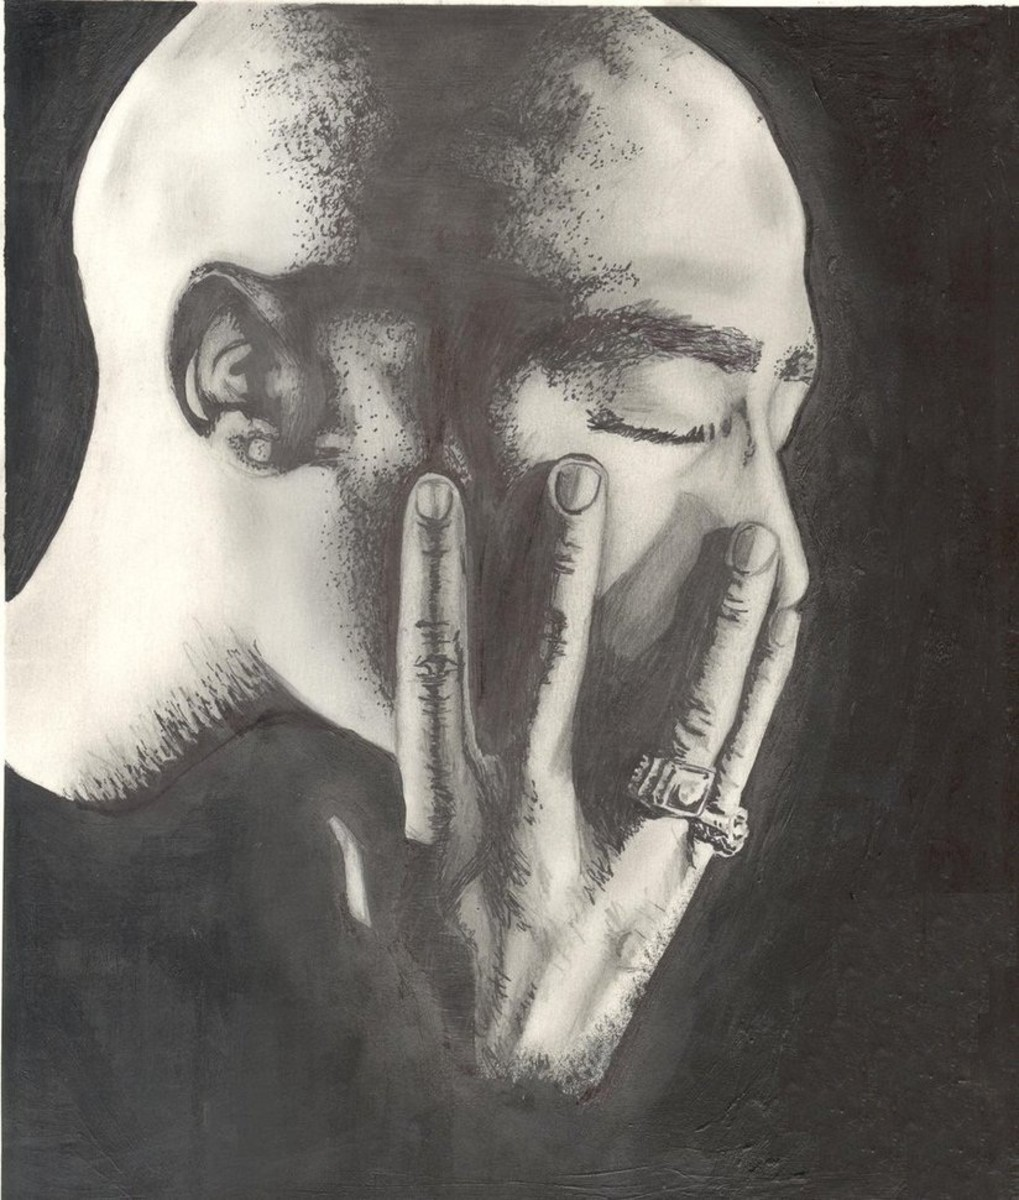 did-tupac-shakur-fake-his-death-new-proof-kasinova-tha-don